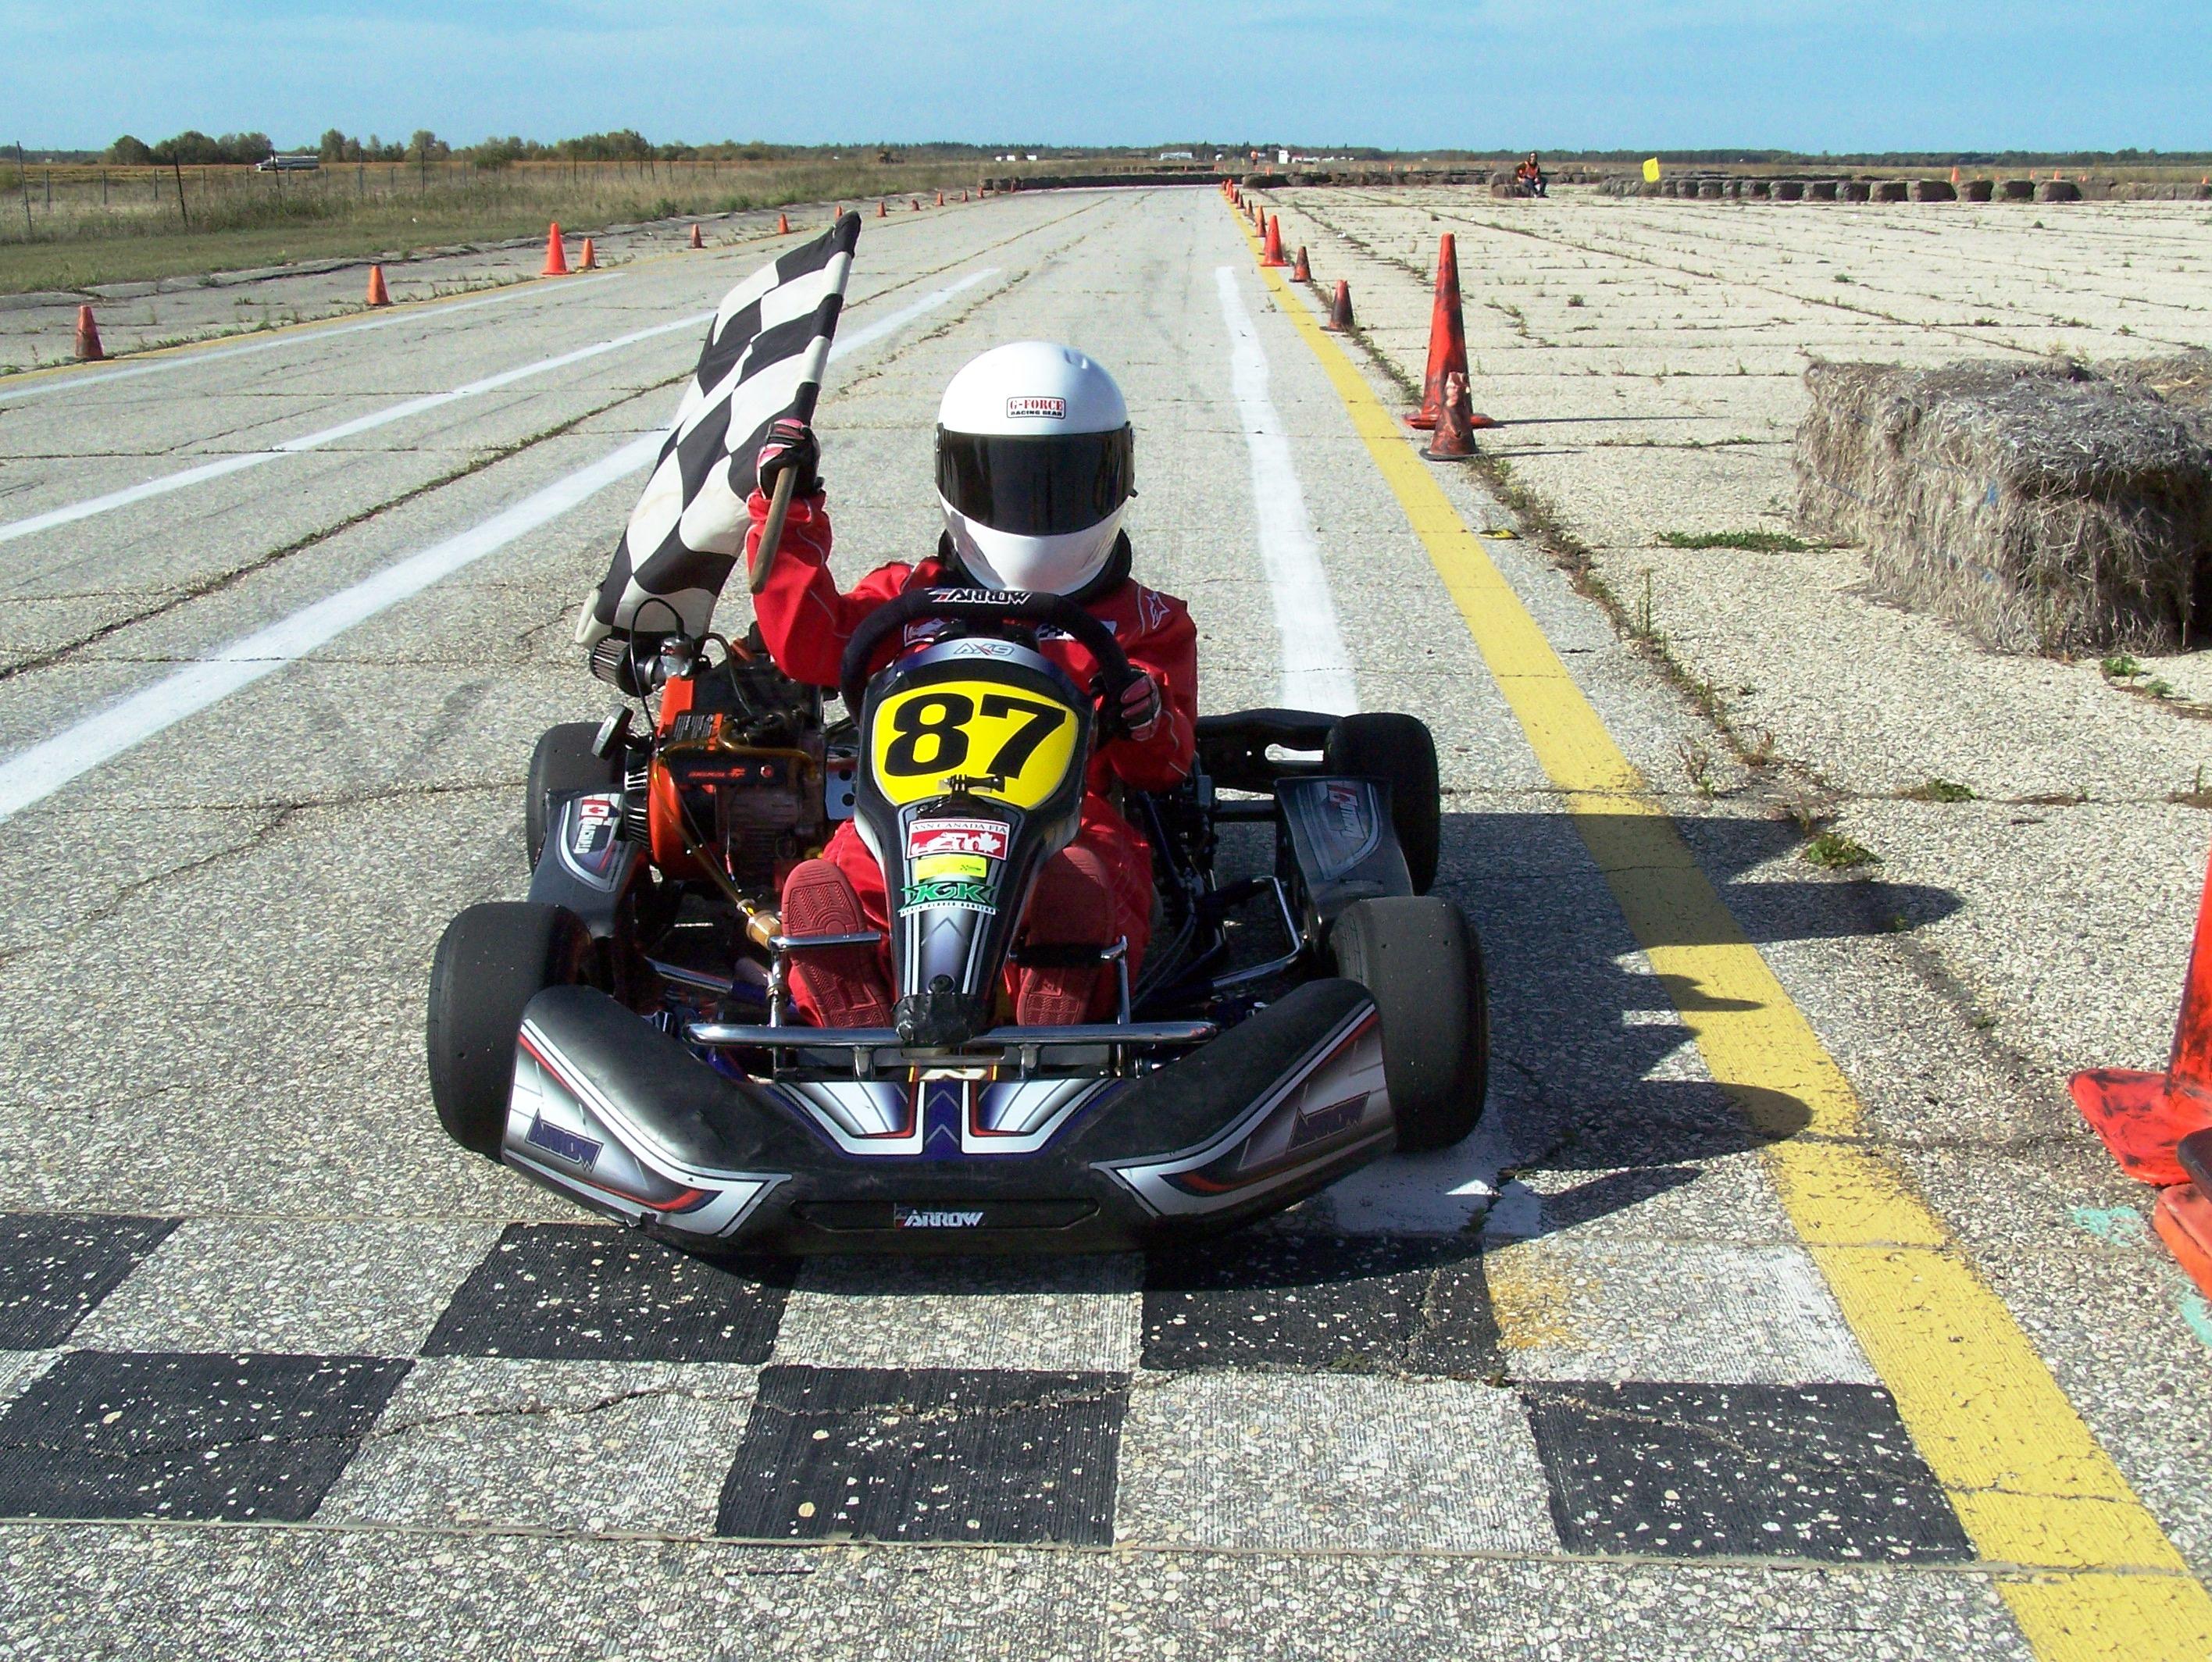 Brad Bachalo J1 Briggs MKA Class Winner